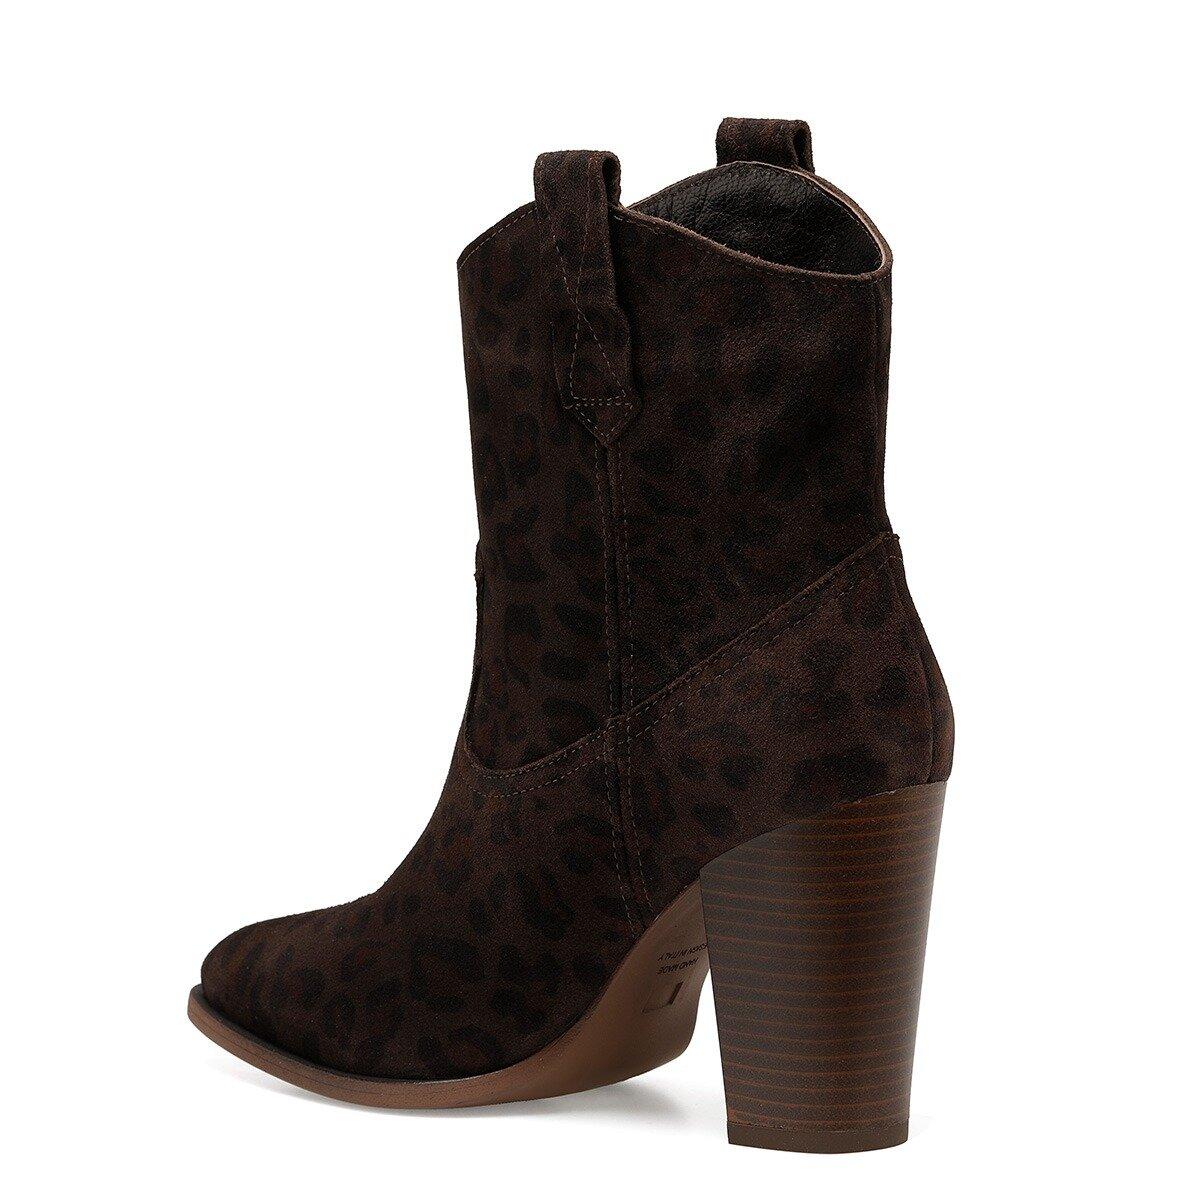 WILDY Kahverengi Kadın Topuklu Bot